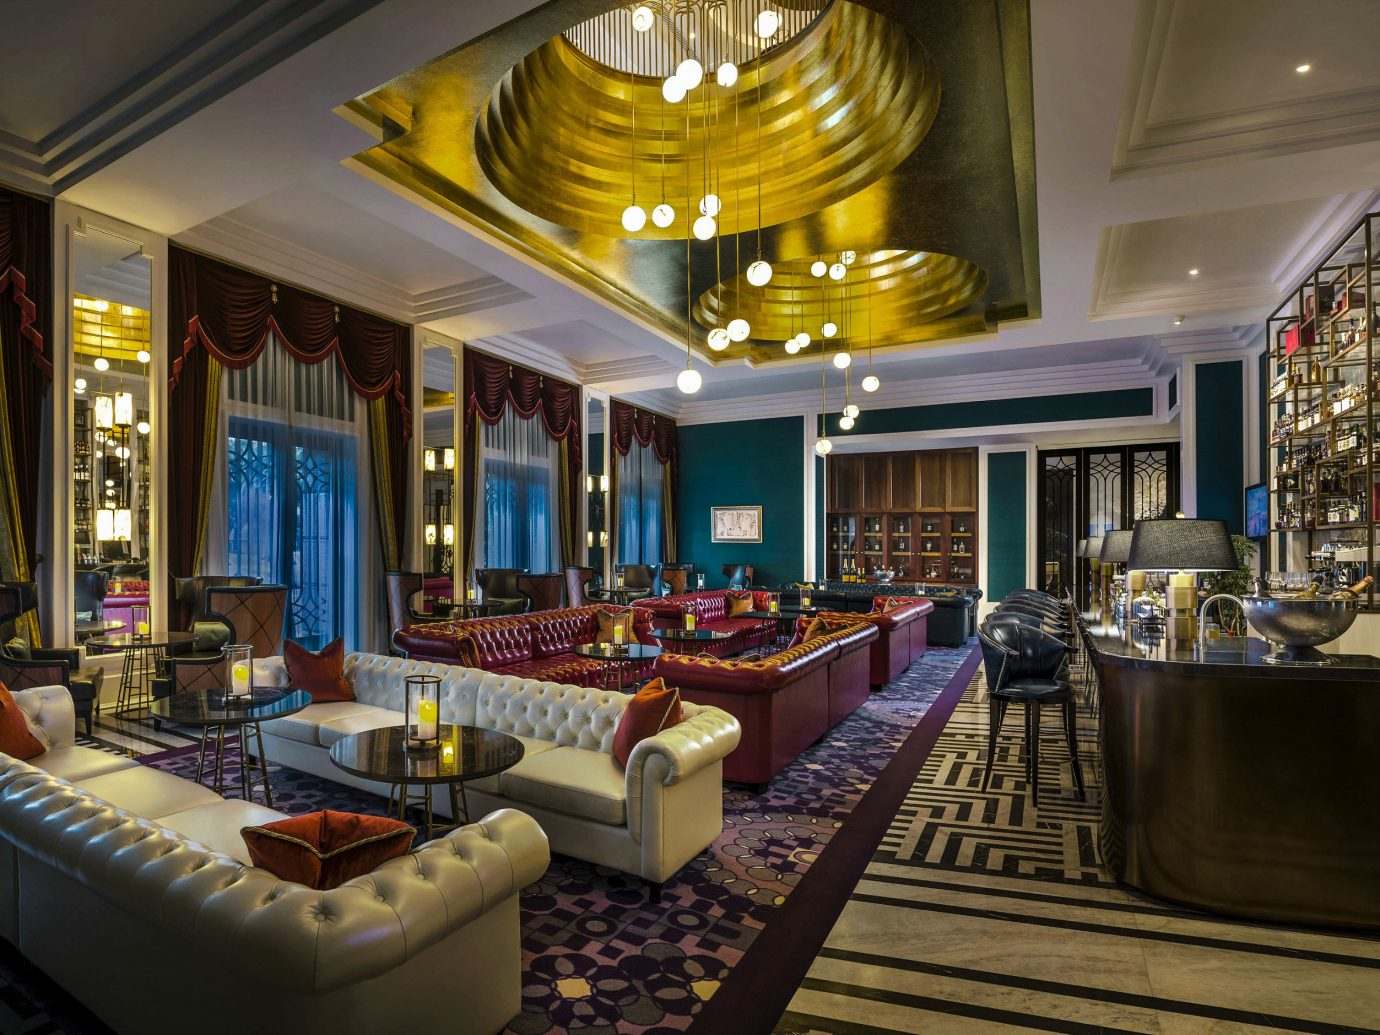 Boutique Hotels Luxury Travel indoor ceiling floor room window interior design Lobby living room estate furniture several